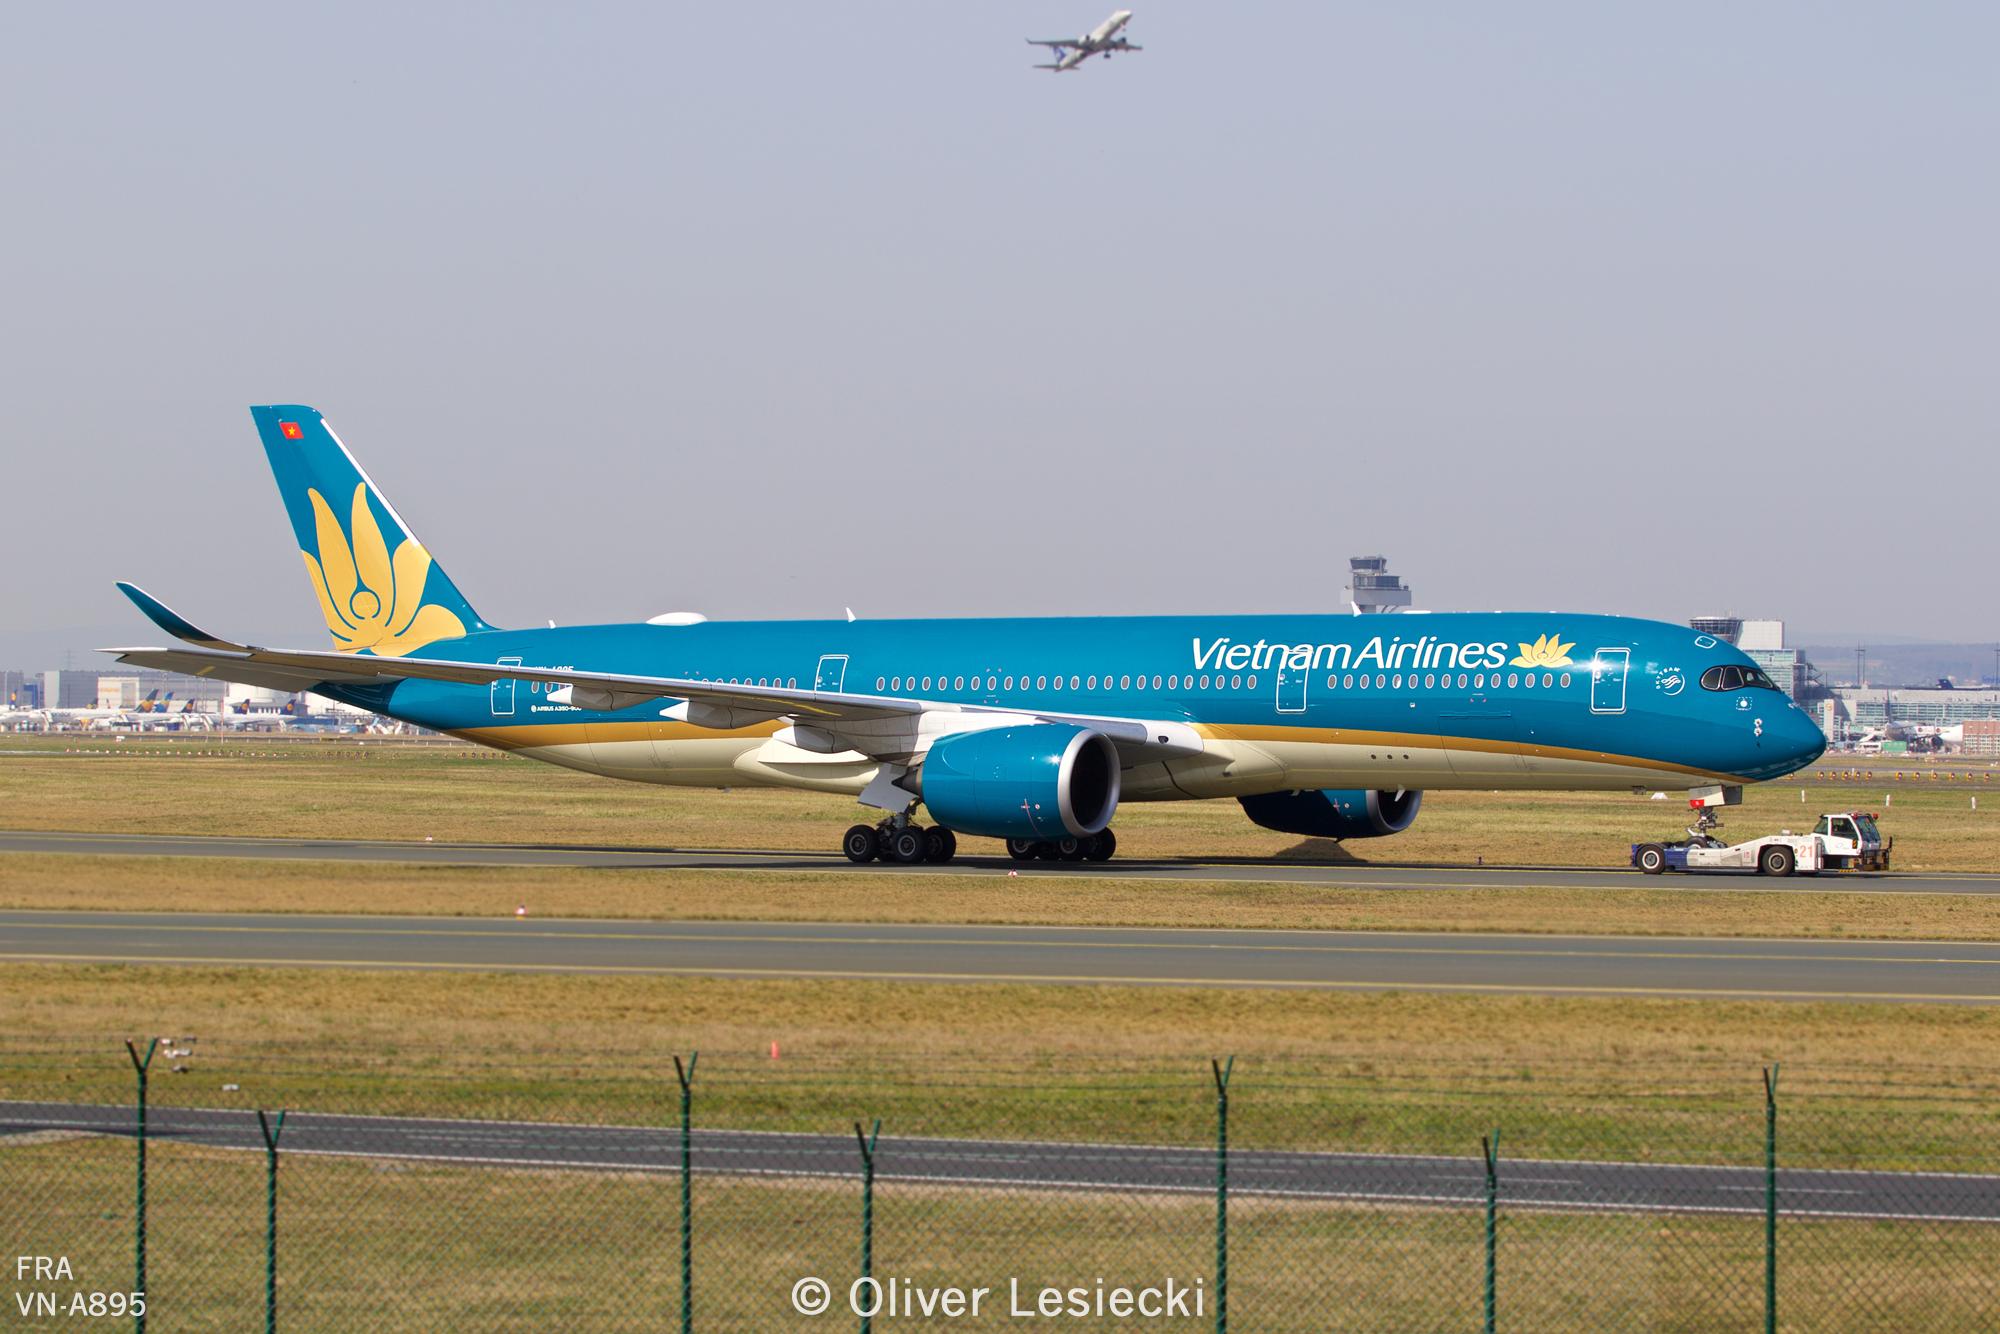 X_VietnamAirlines_A350_VNA895_02_FRA_080418